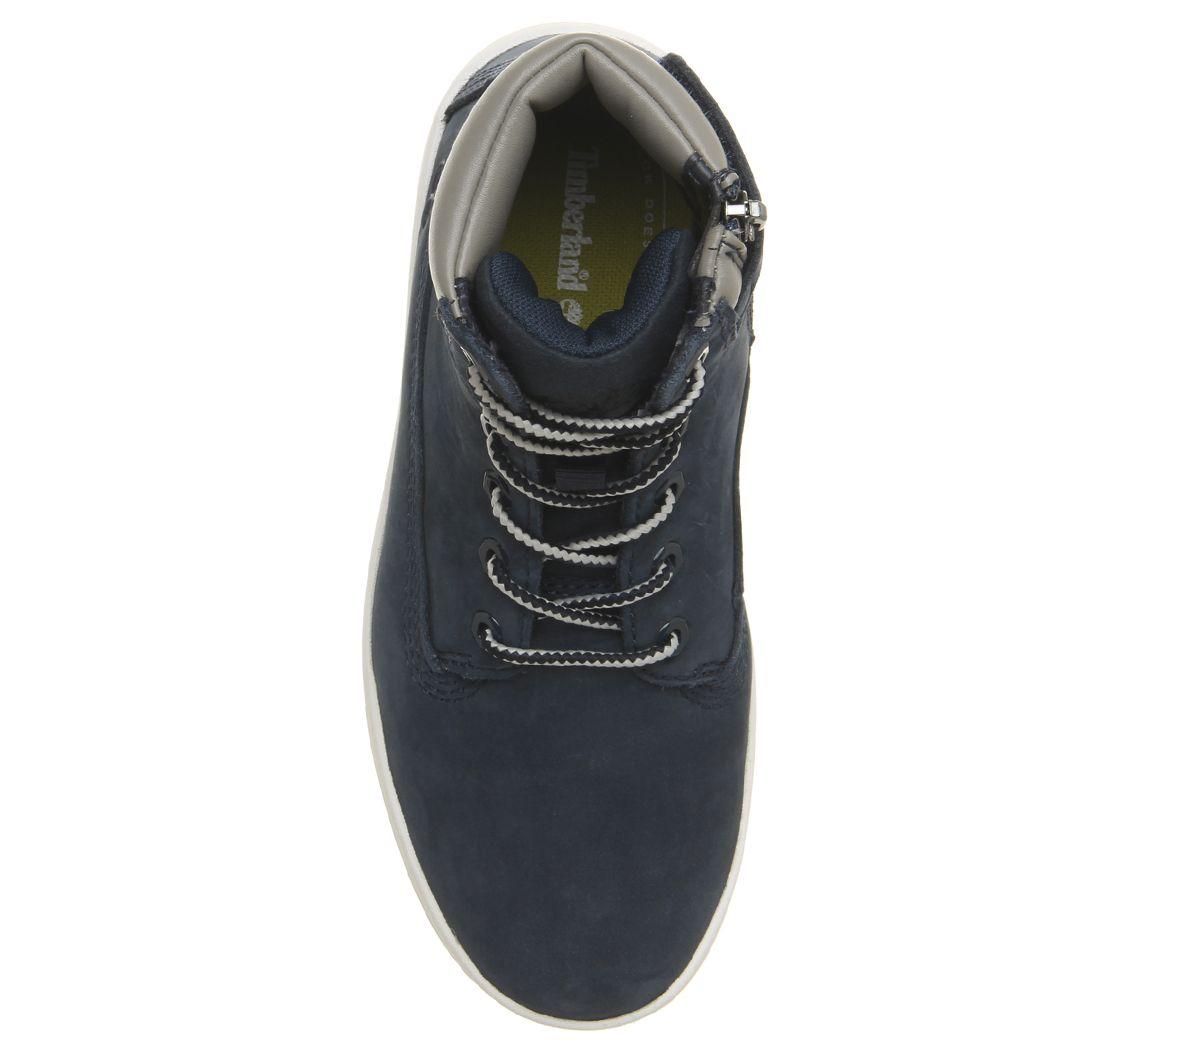 Davis Timberland Details Marineblau Stiefel 15 2cm Kinder About Jugend Naturebuck Quadratisch vn8ywN0Om